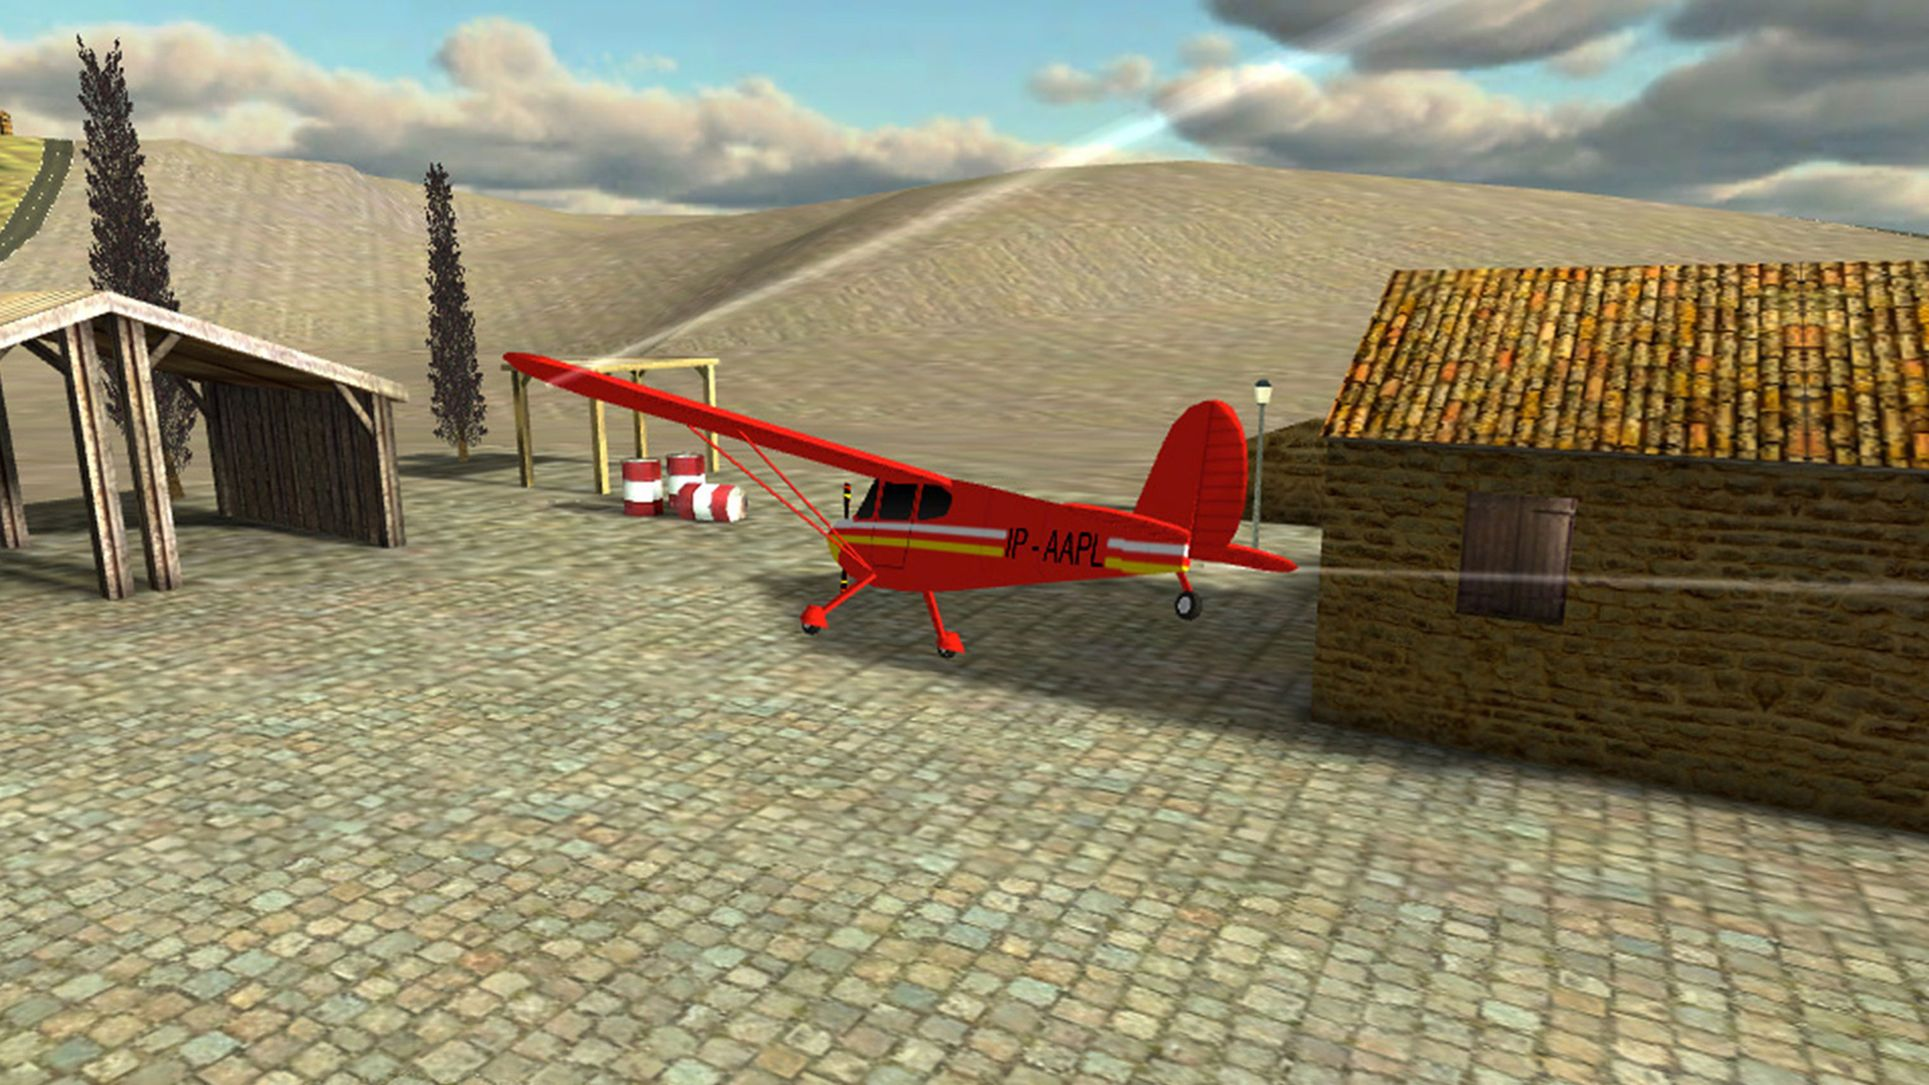 Rc Plane 2 SimulationRacingiosSports (With images